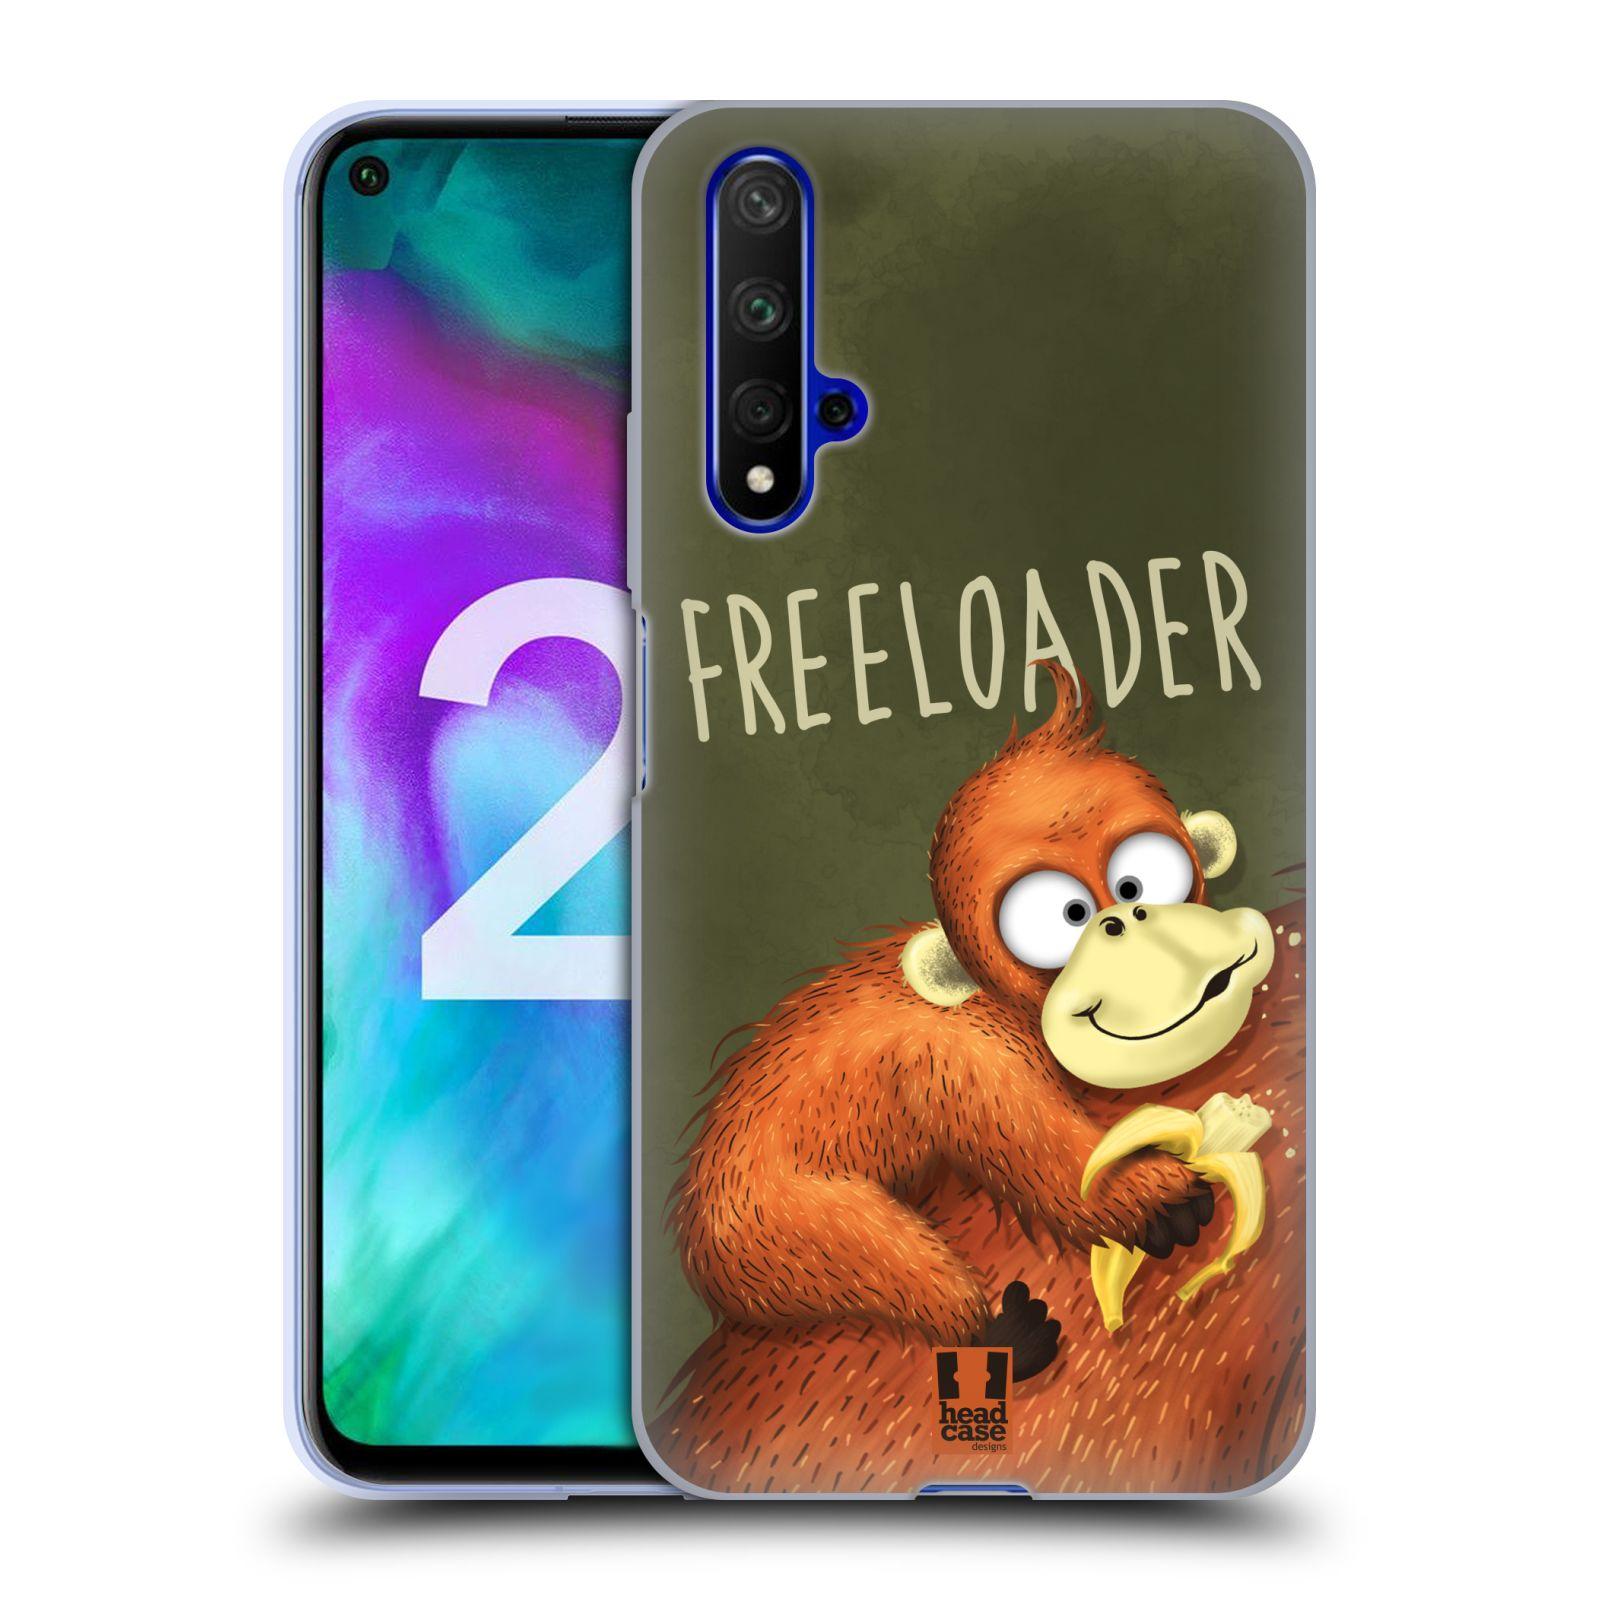 Silikonové pouzdro na mobil Honor 20 - Head Case - Opičák Freeloader